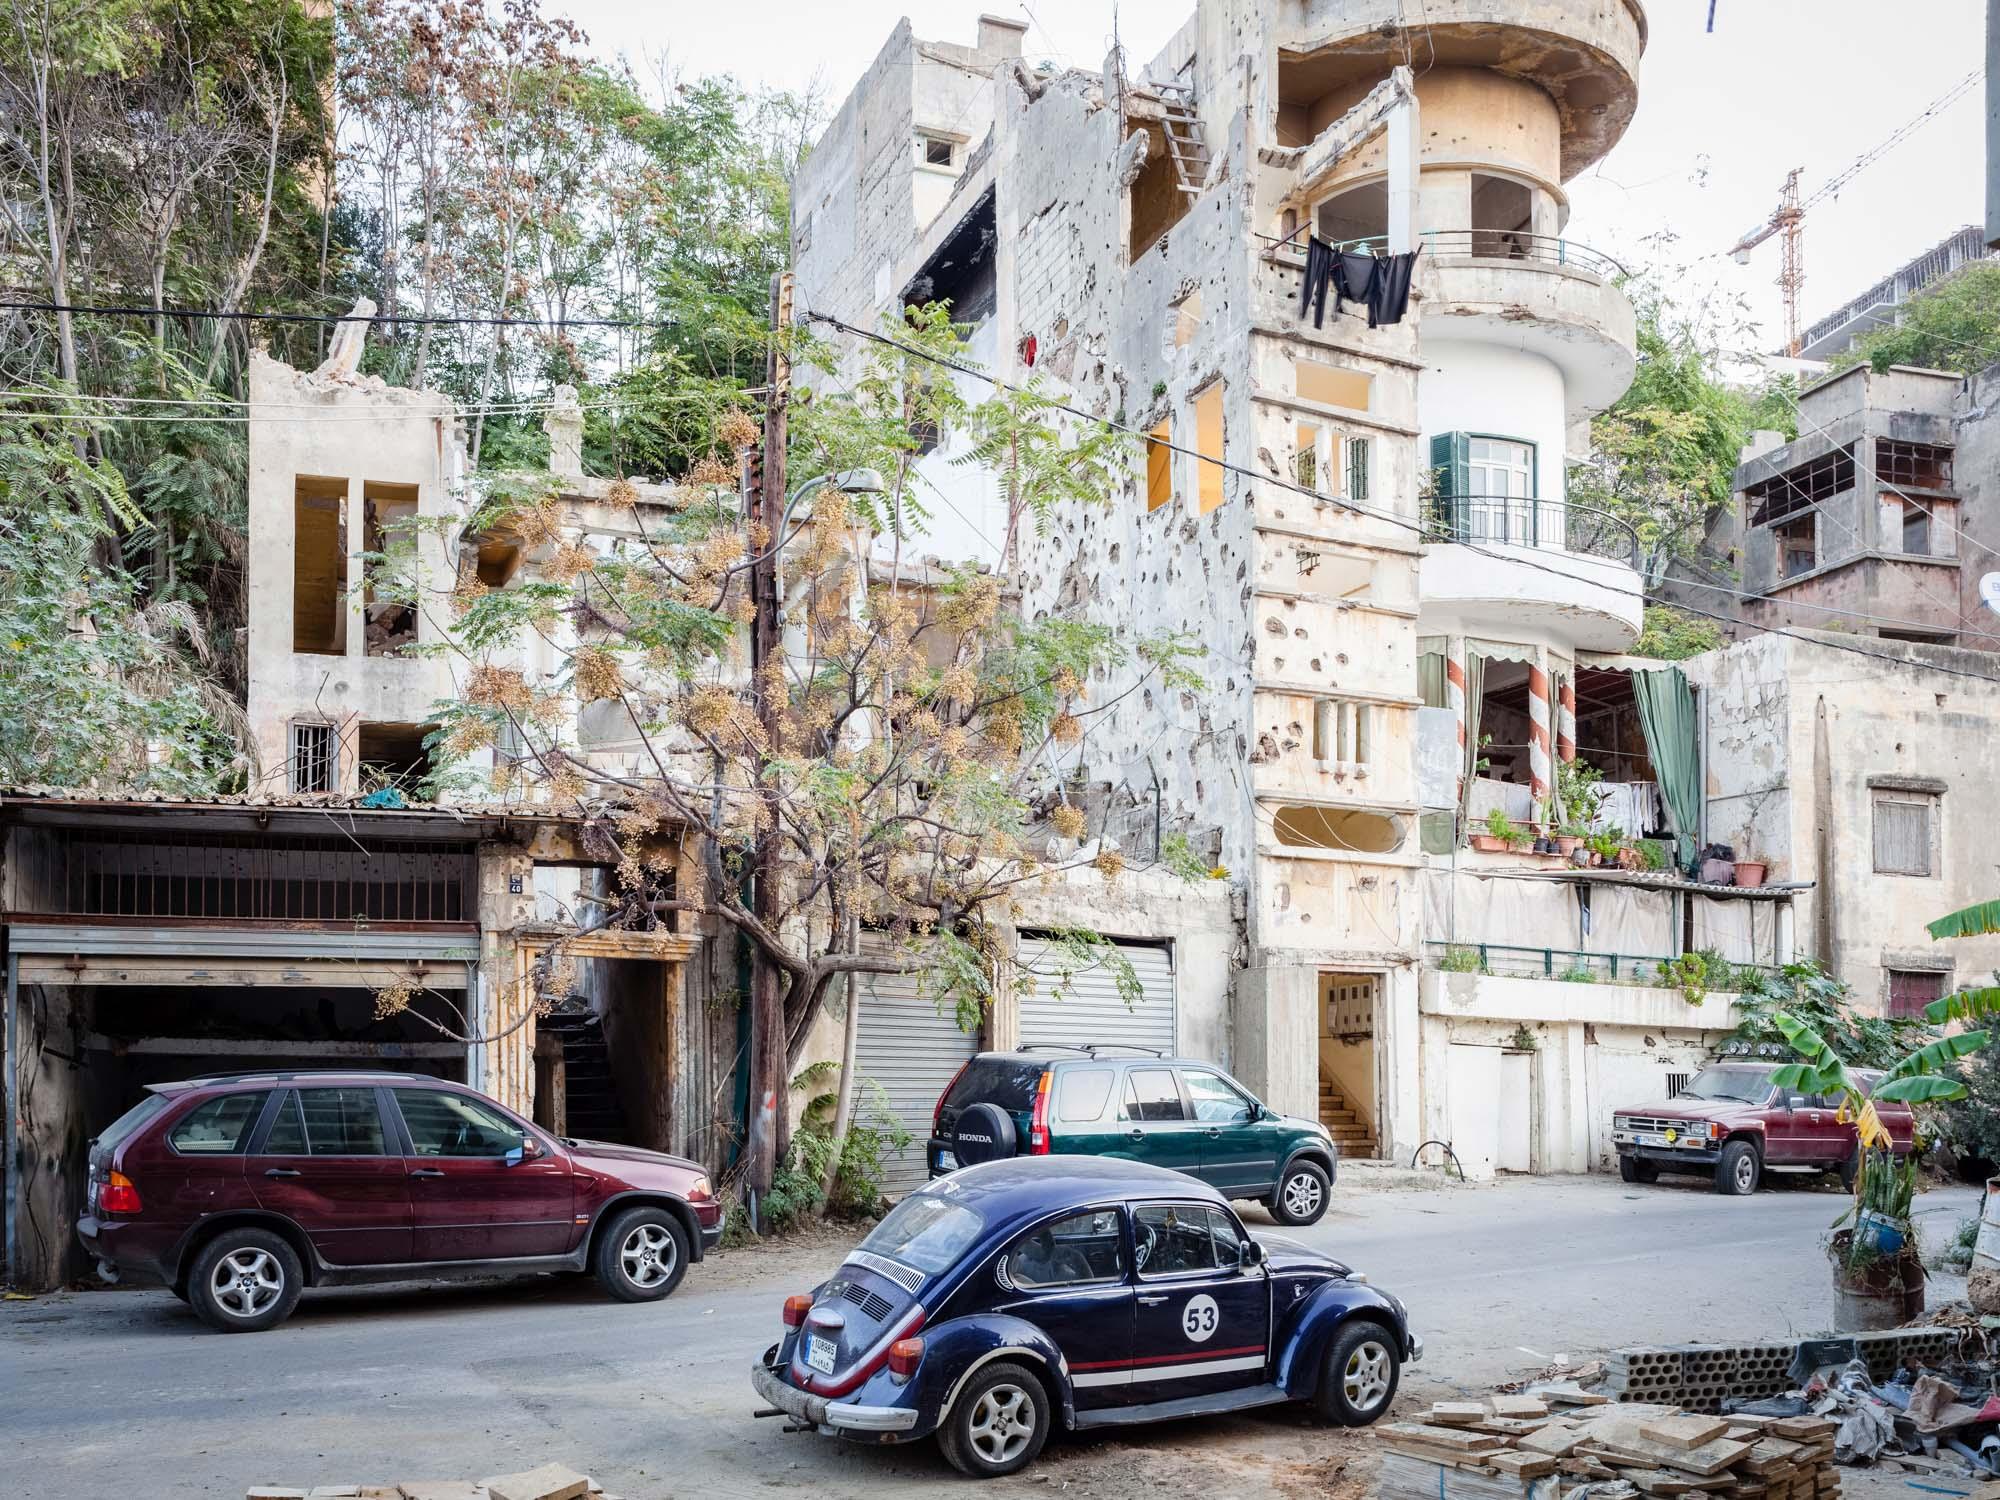 Beirut-8649-Bearbeitet.jpg